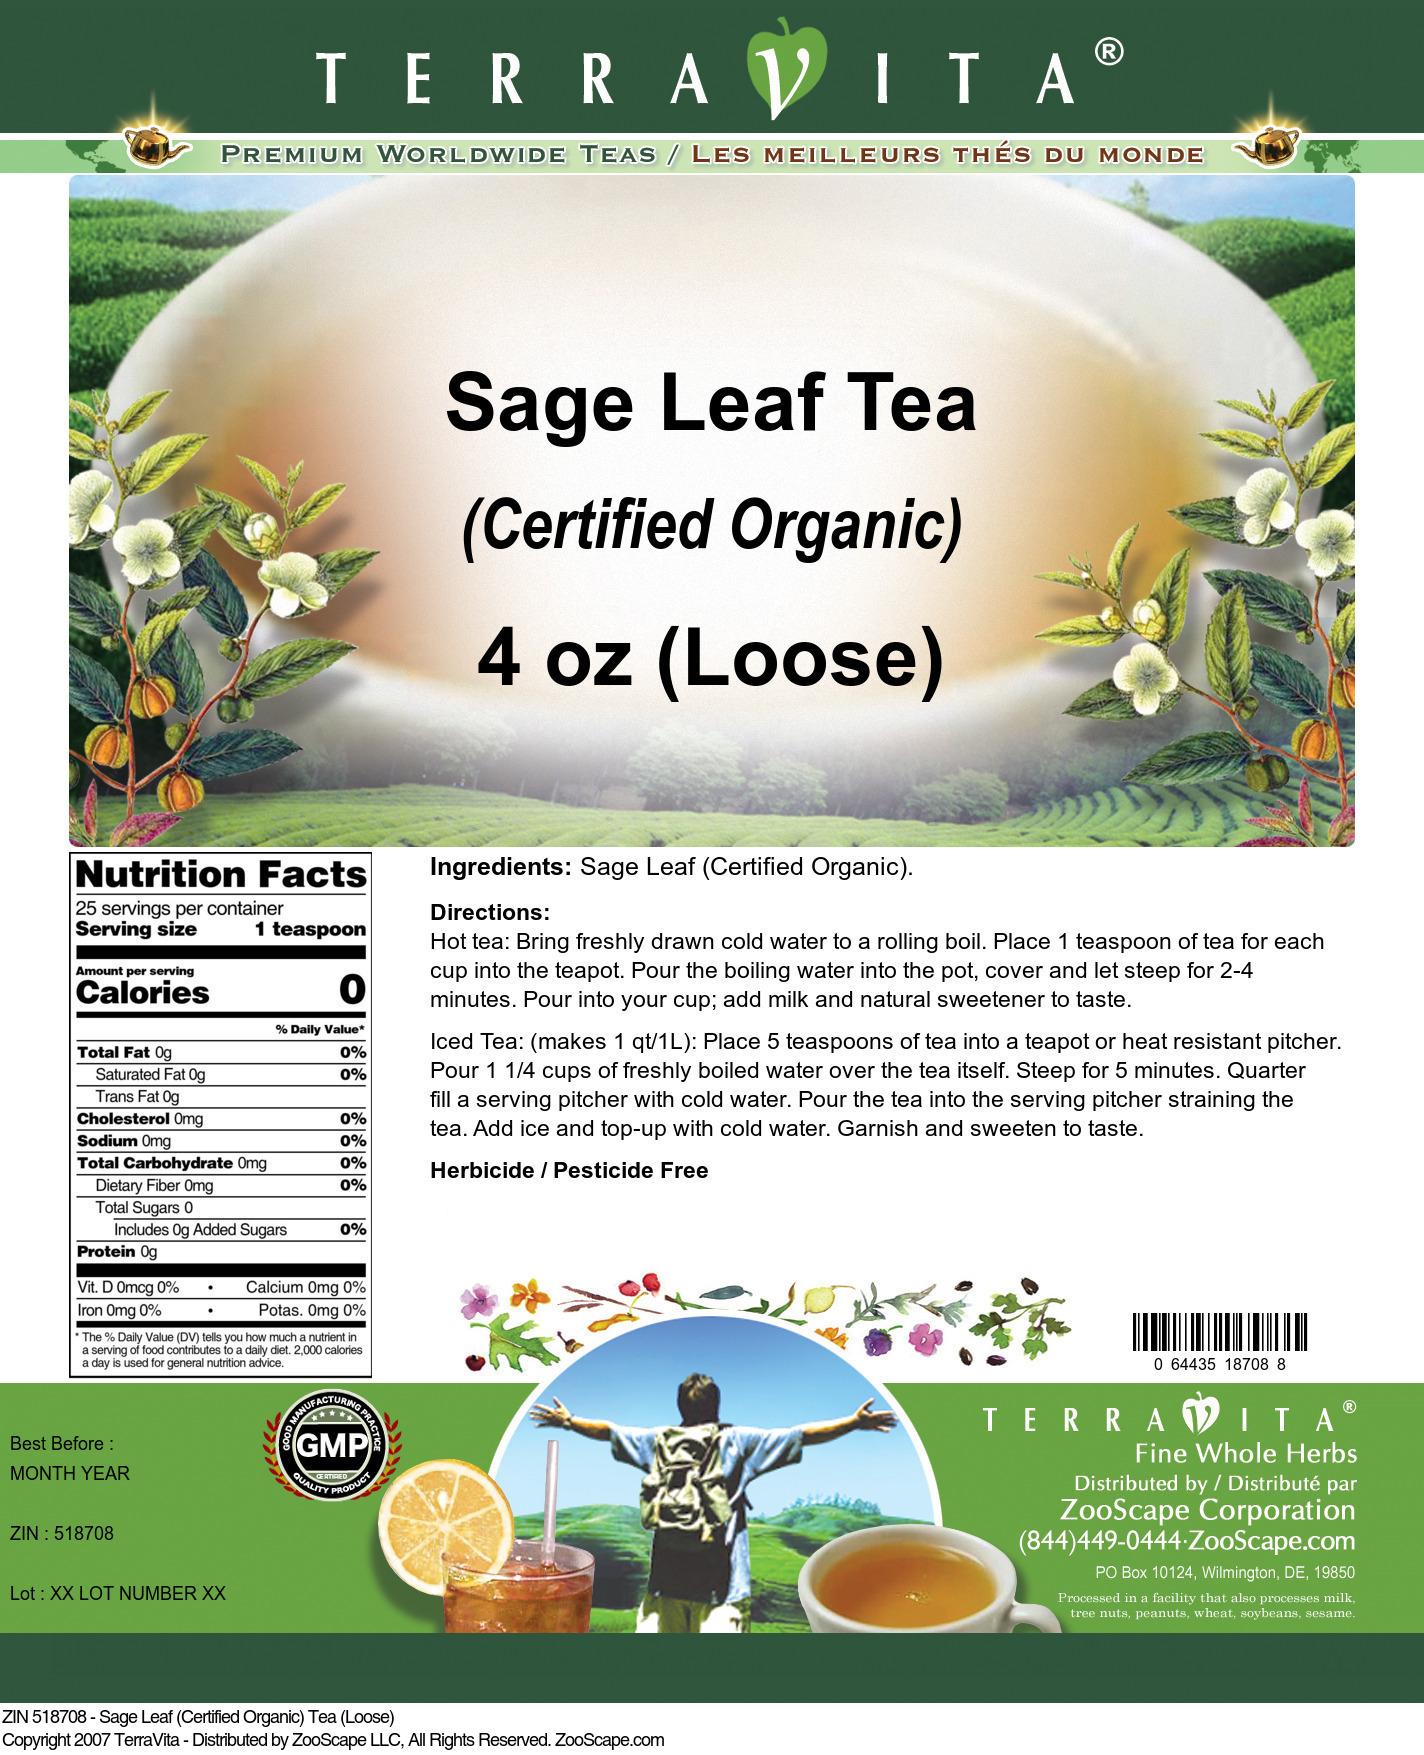 Sage Leaf